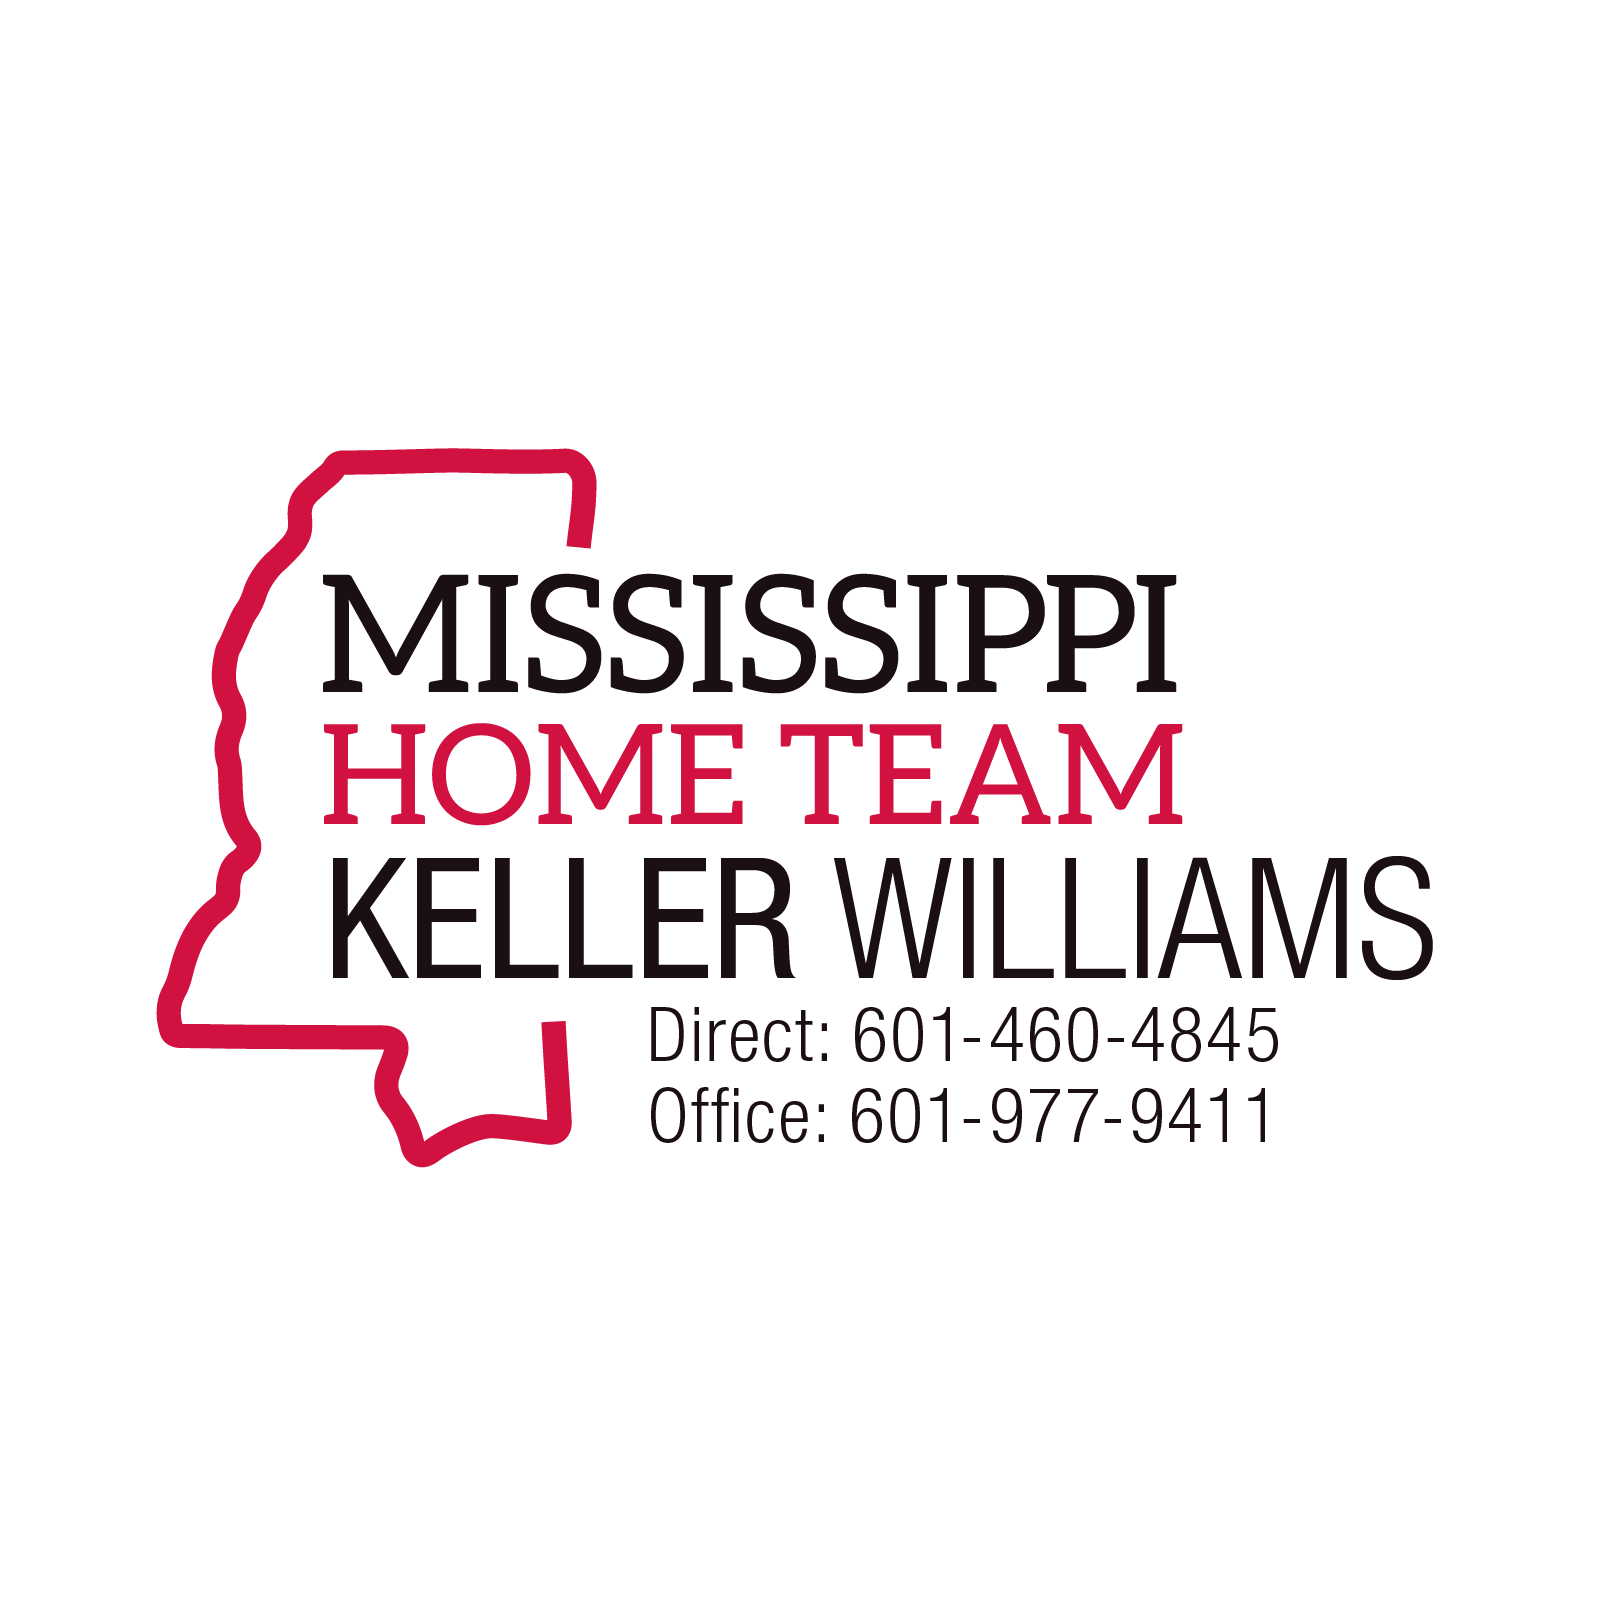 Mississippi Home Team of Keller Williams logo